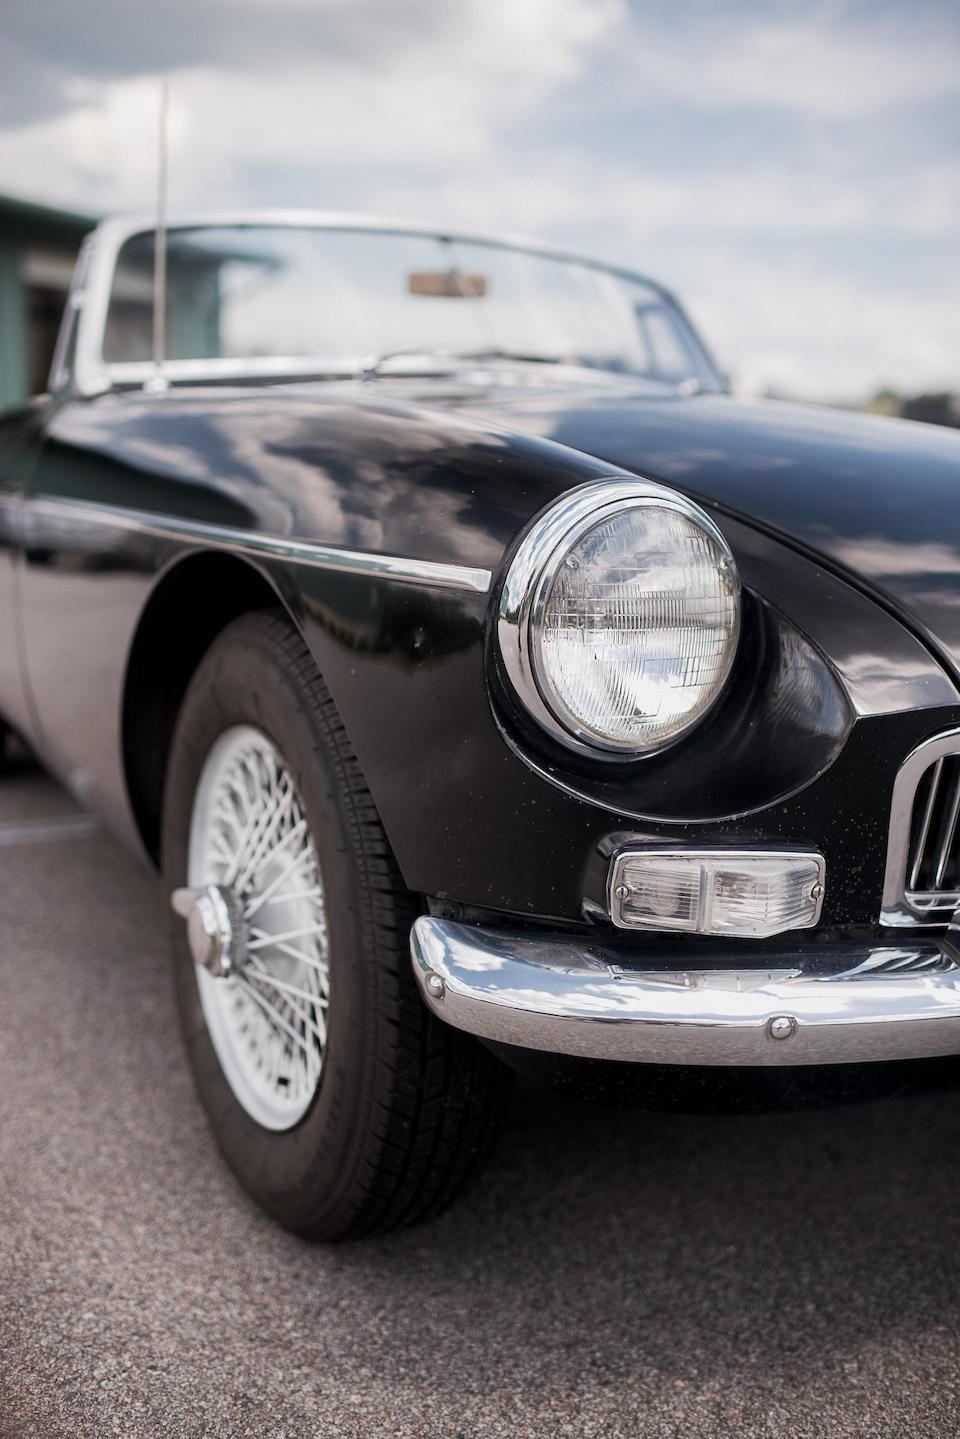 <b>1964 MG B Roadster</b><br />Chassis no. GHN3L/51533<br />Engine no. 18GB-RU-H3197